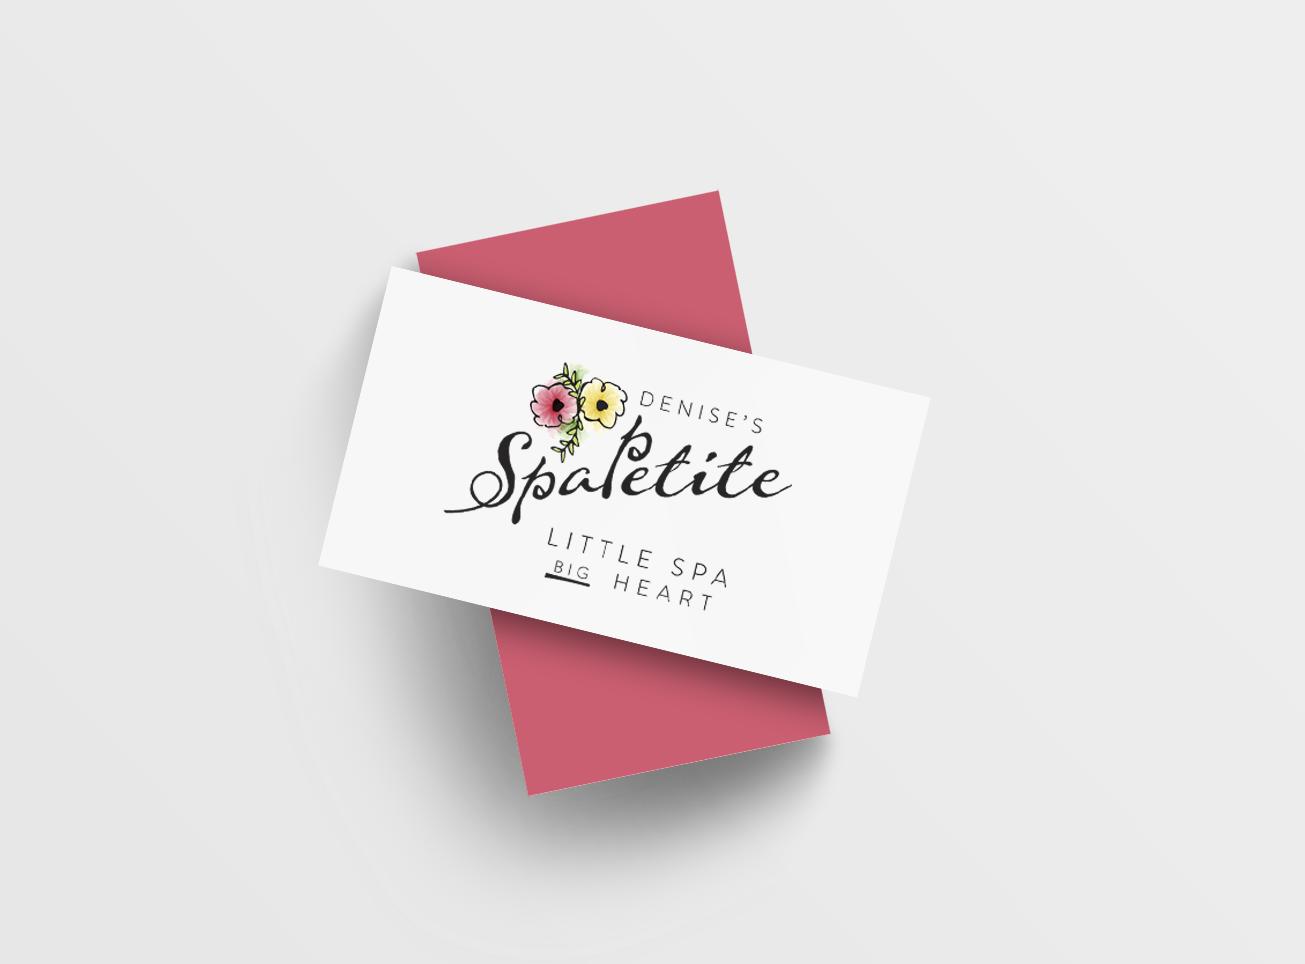 spa petite logo